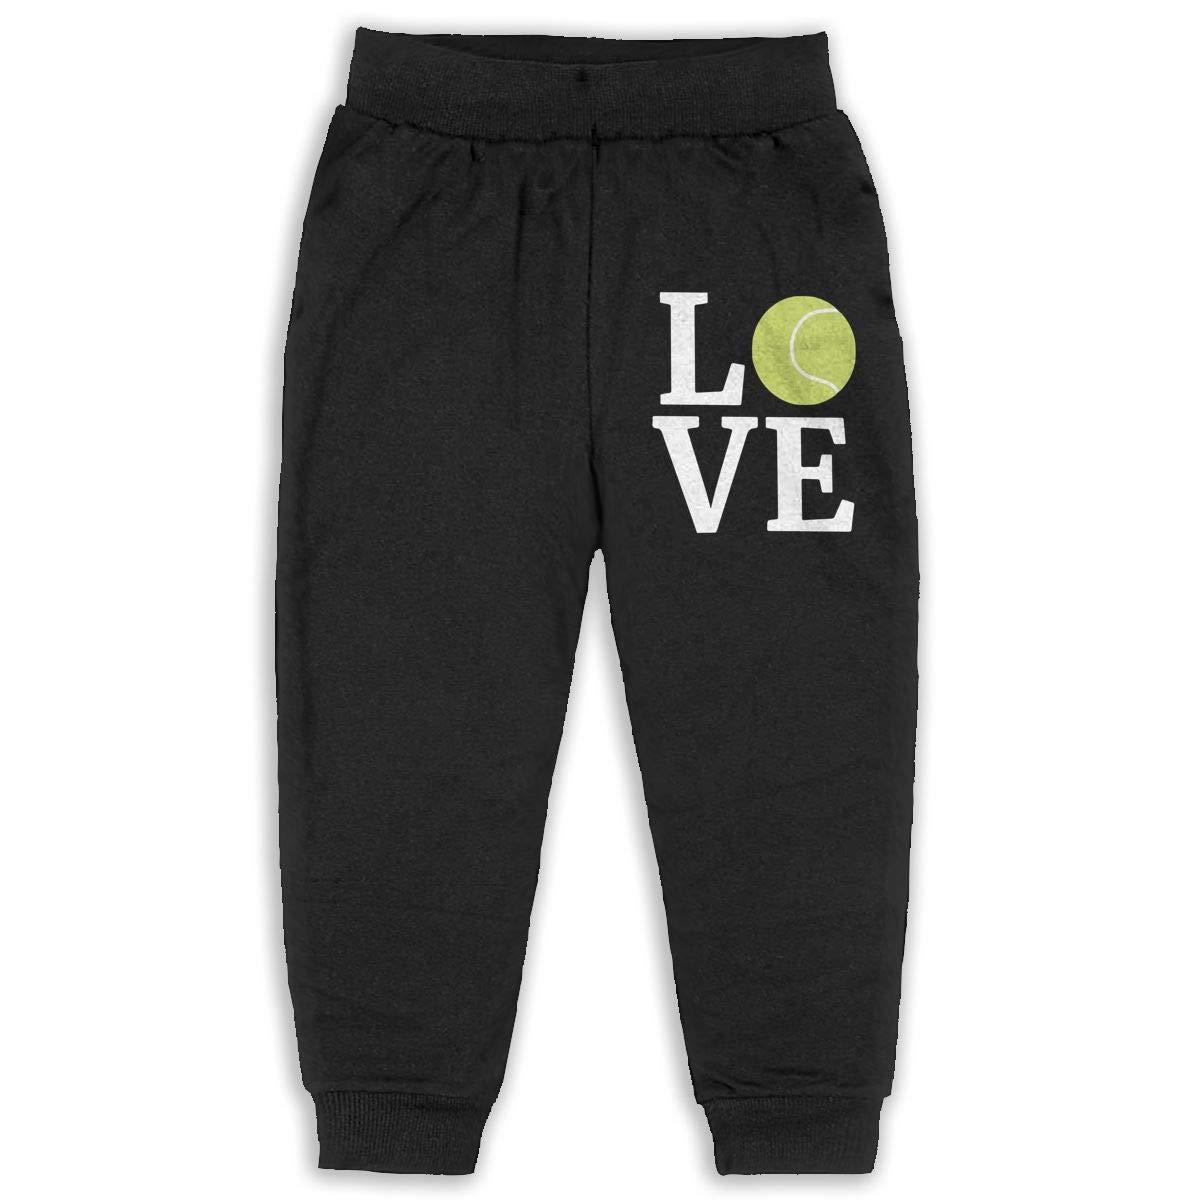 Kids /& Toddler Pants Soft Cozy Baby Sweatpants Love Tennis Ball Fleece Pants Sports Pants